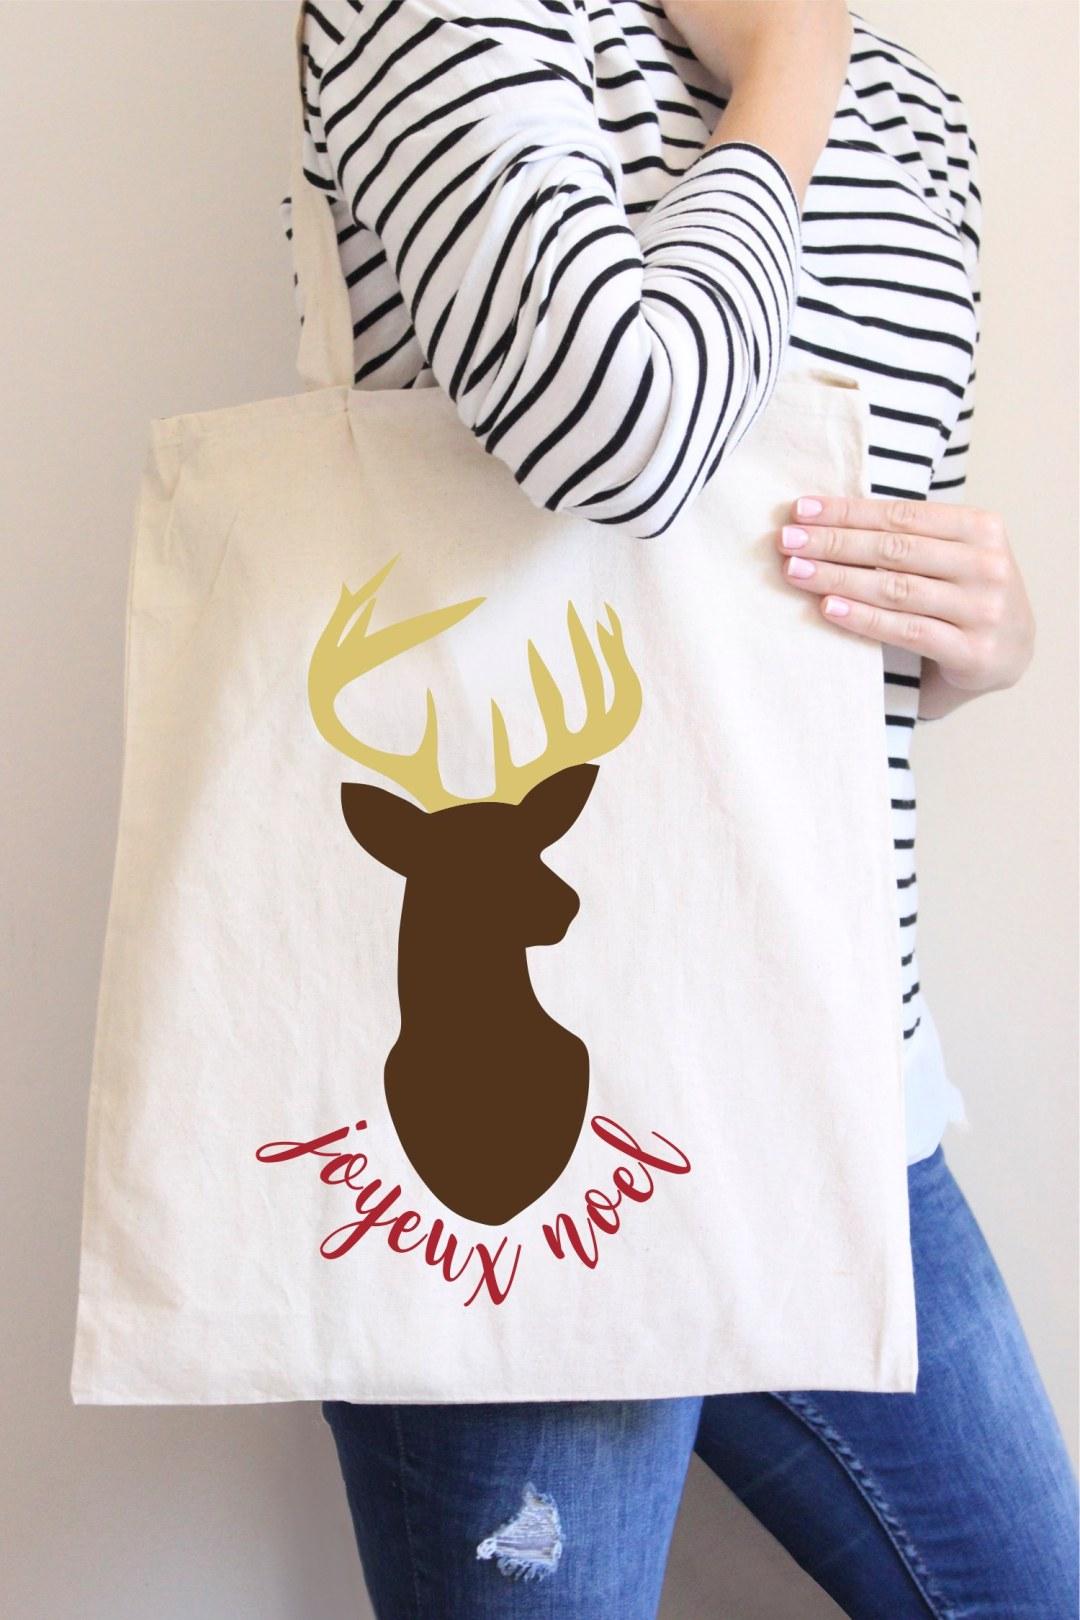 Joyeux Noel Holiday Tote Bag